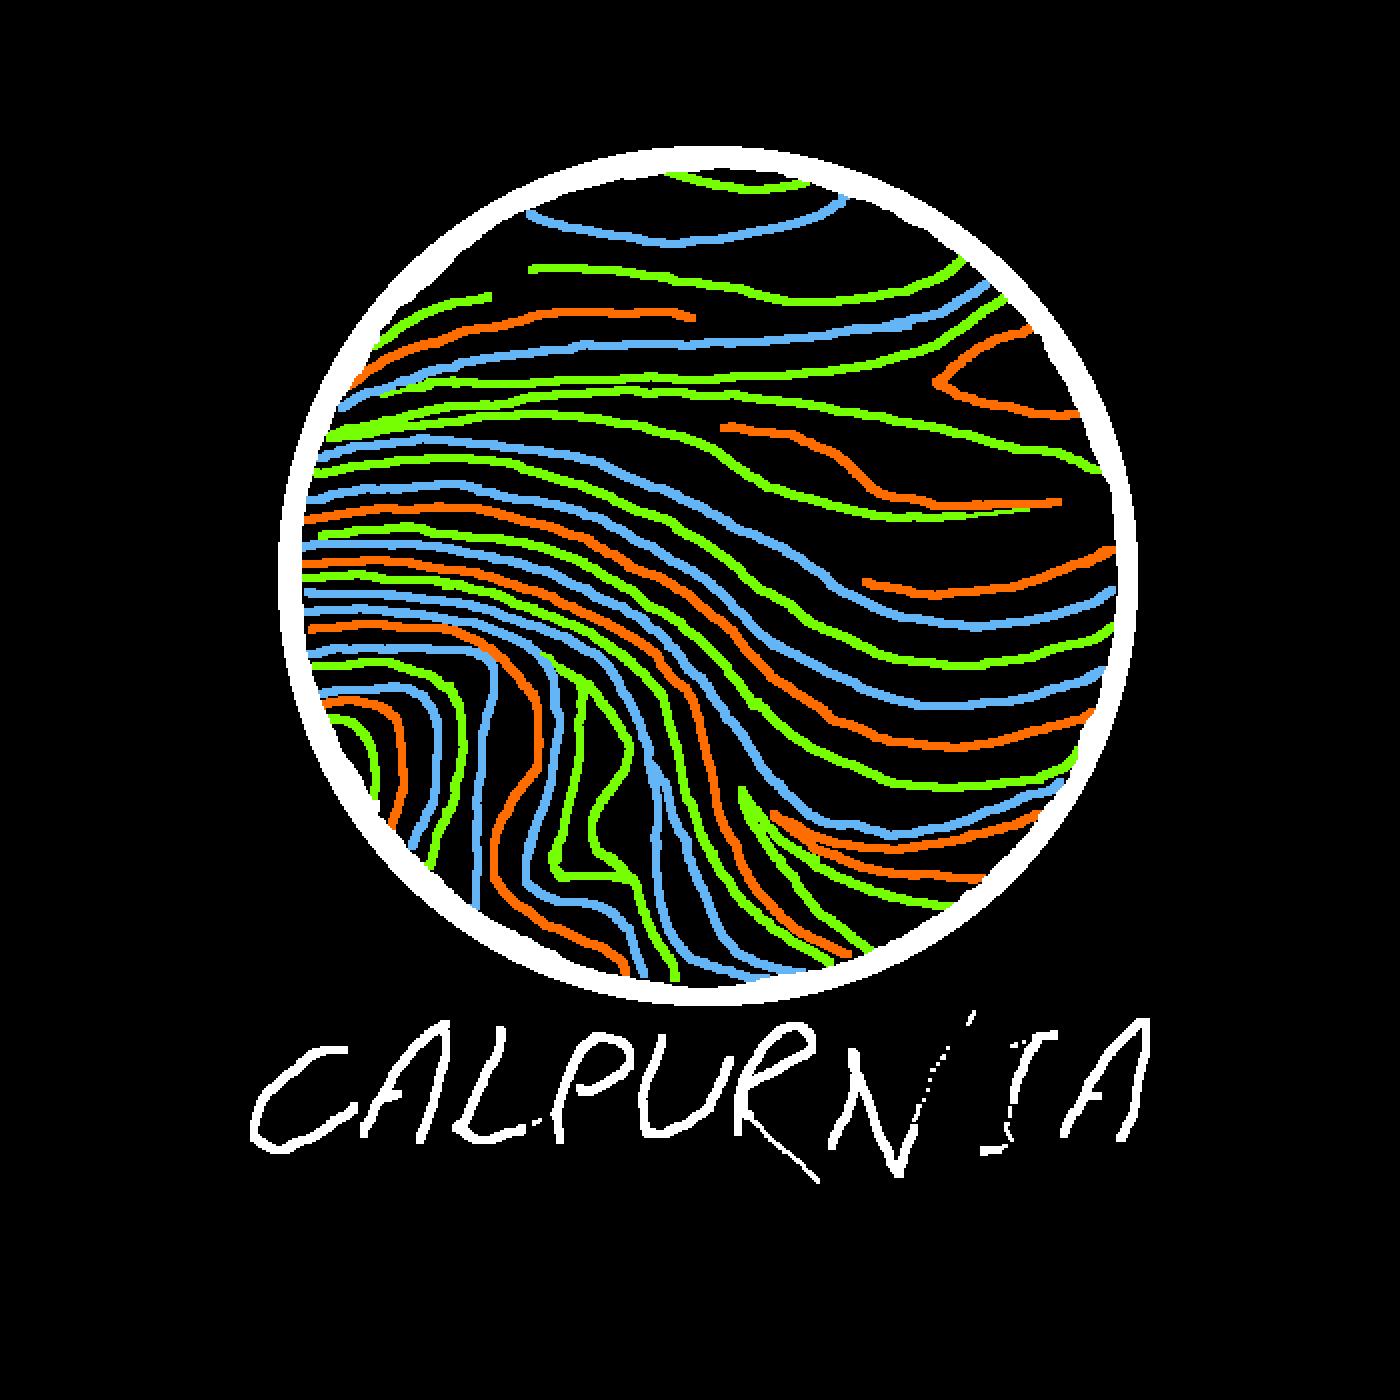 Calpurnia Logo by Bill-Cipher21